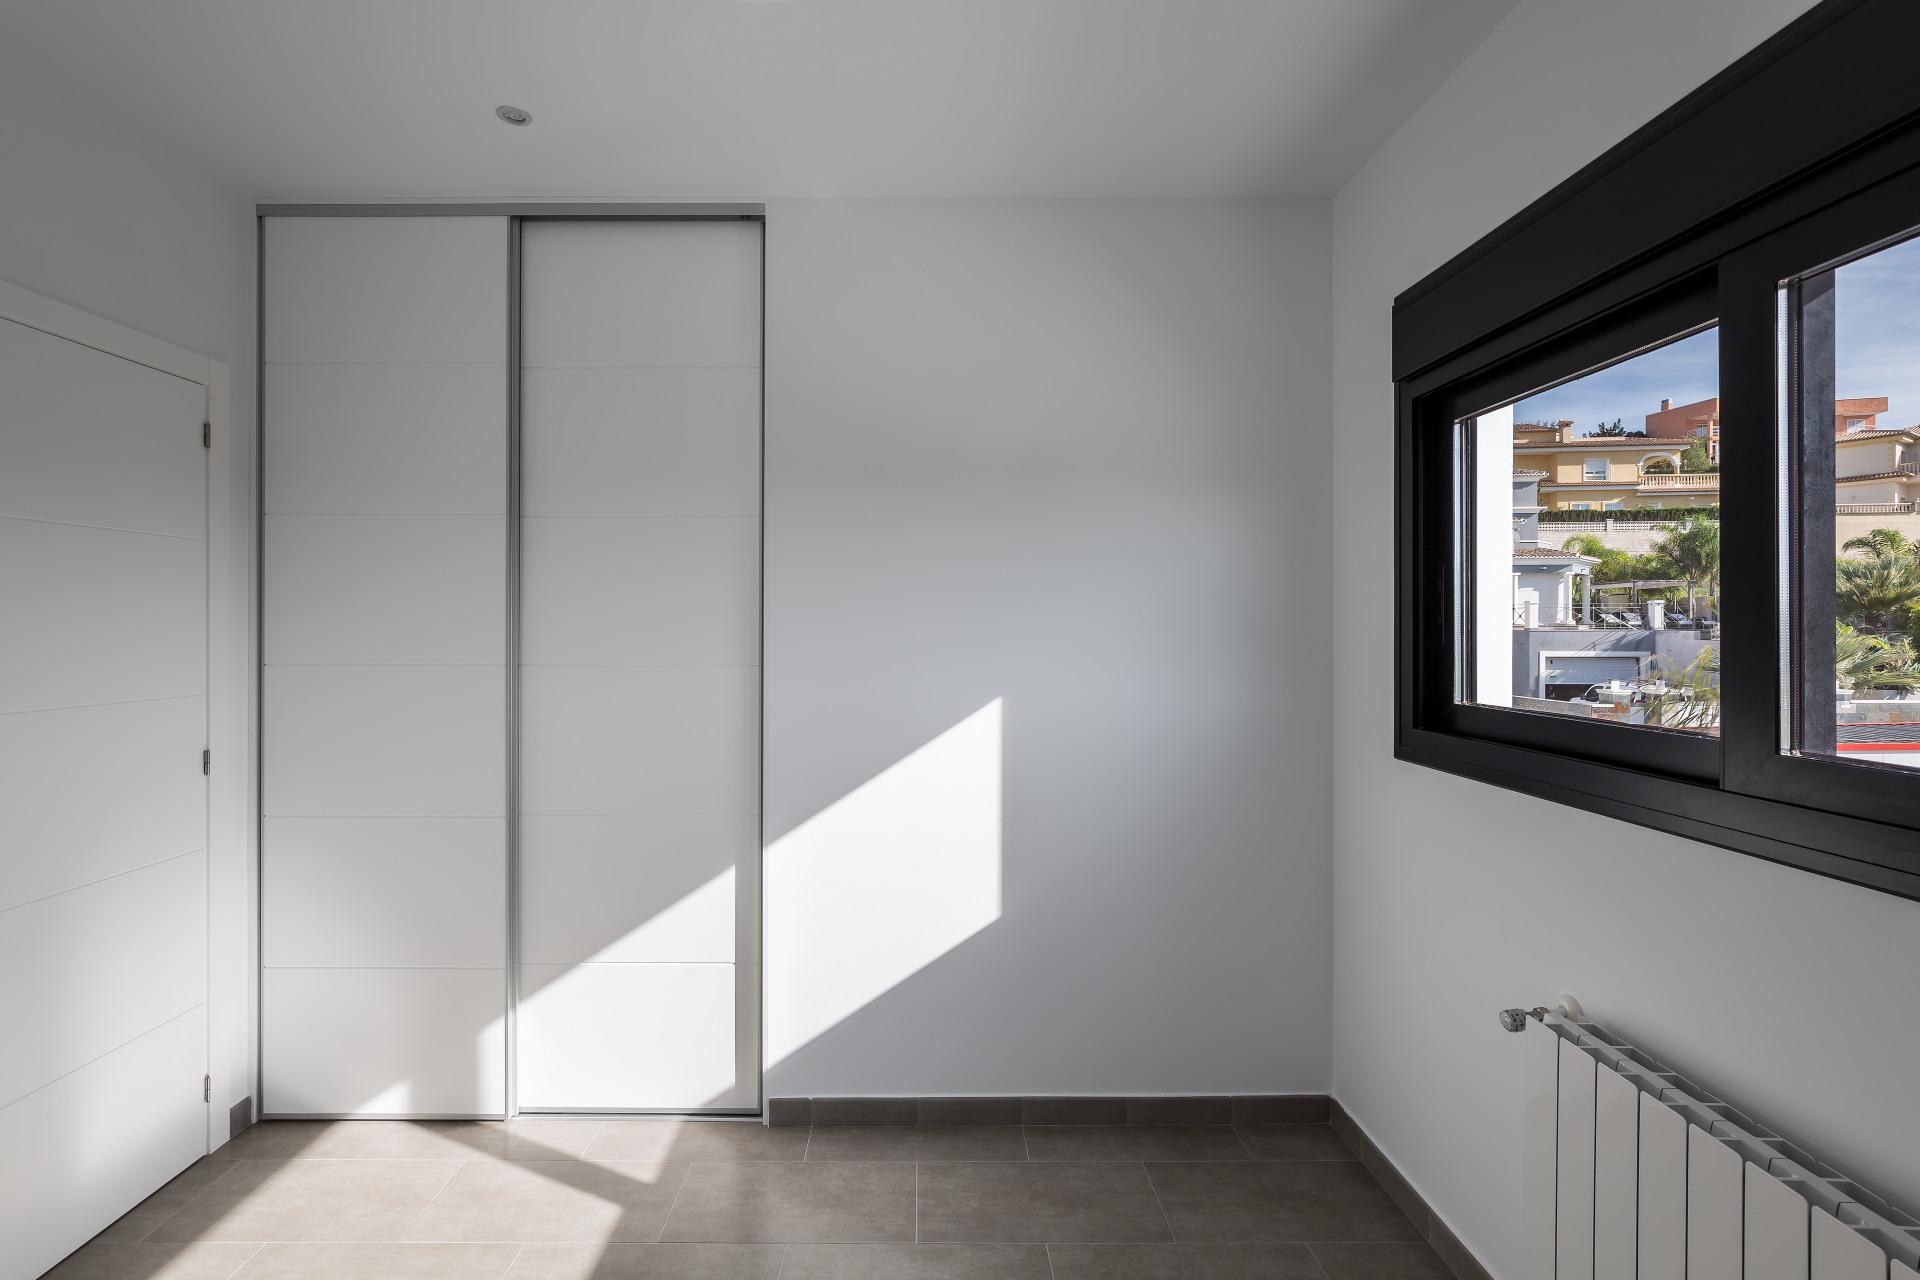 fotografia-arquitectura-valencia-german-cabo-viraje-vivienda-unifamiliar-calpe (40)